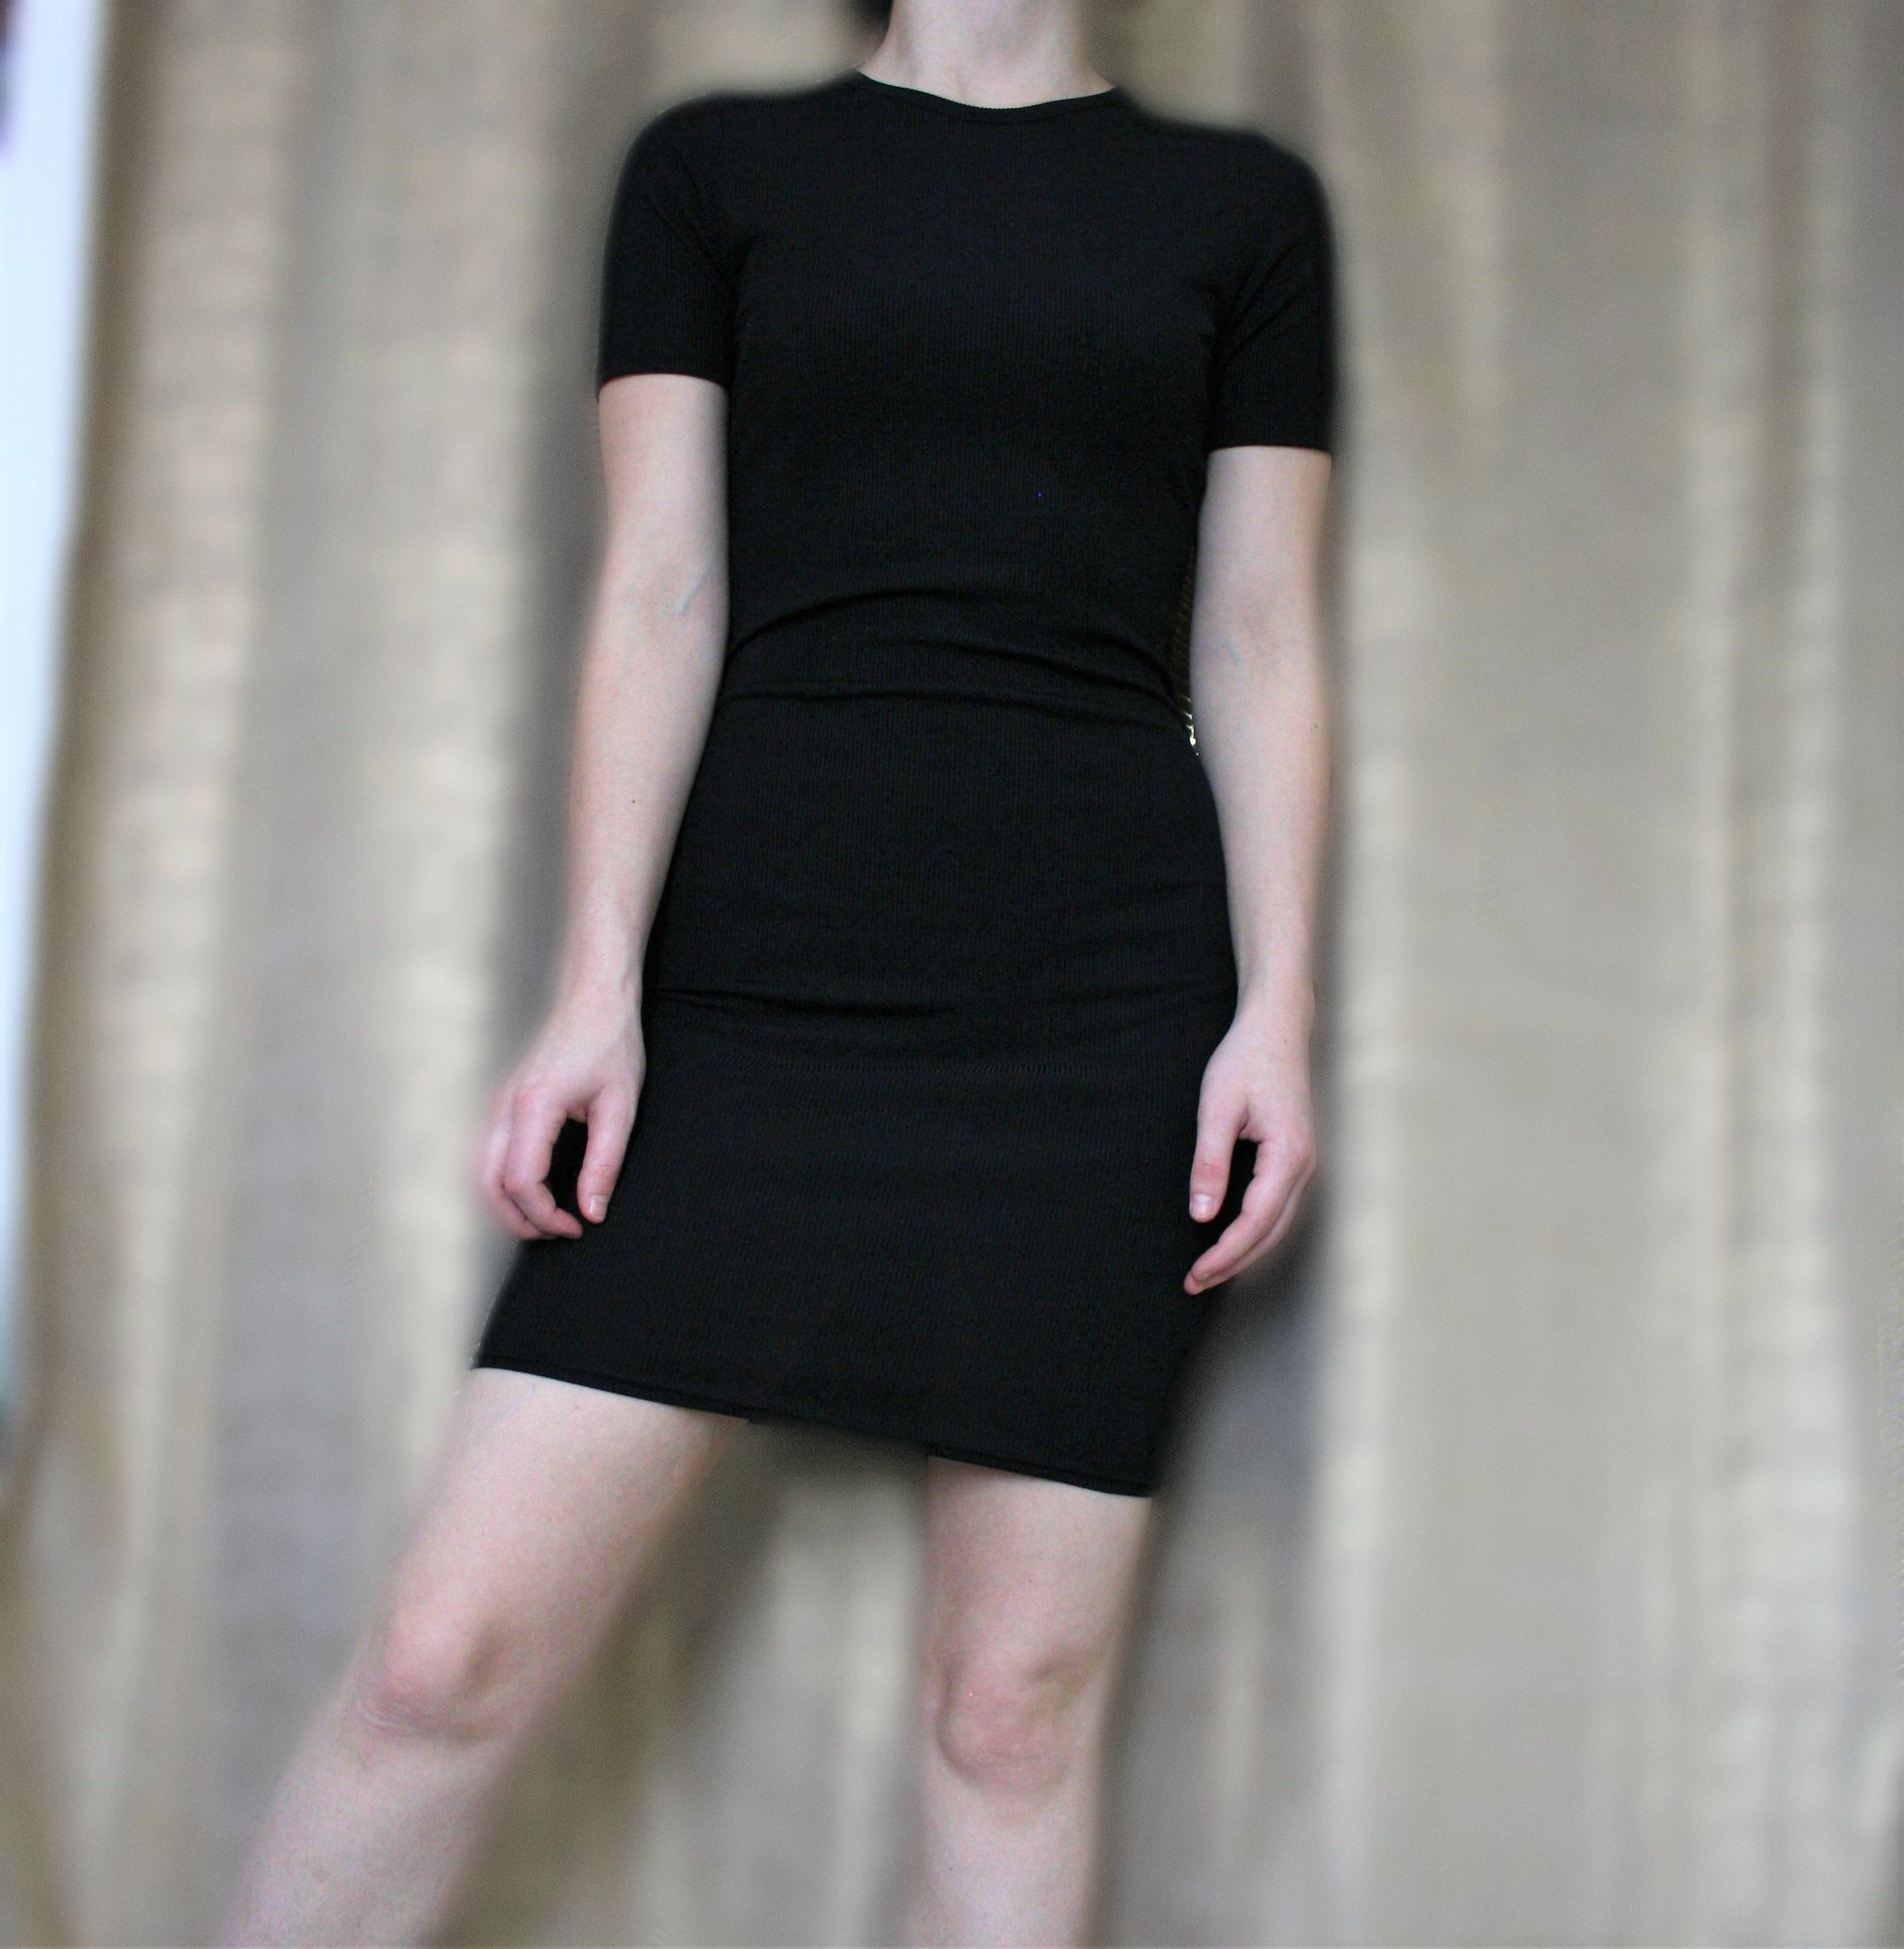 7b2196e0361 À vendre sur    vintedfrance  vinted  vintedfemme  femme  robe  robefemme